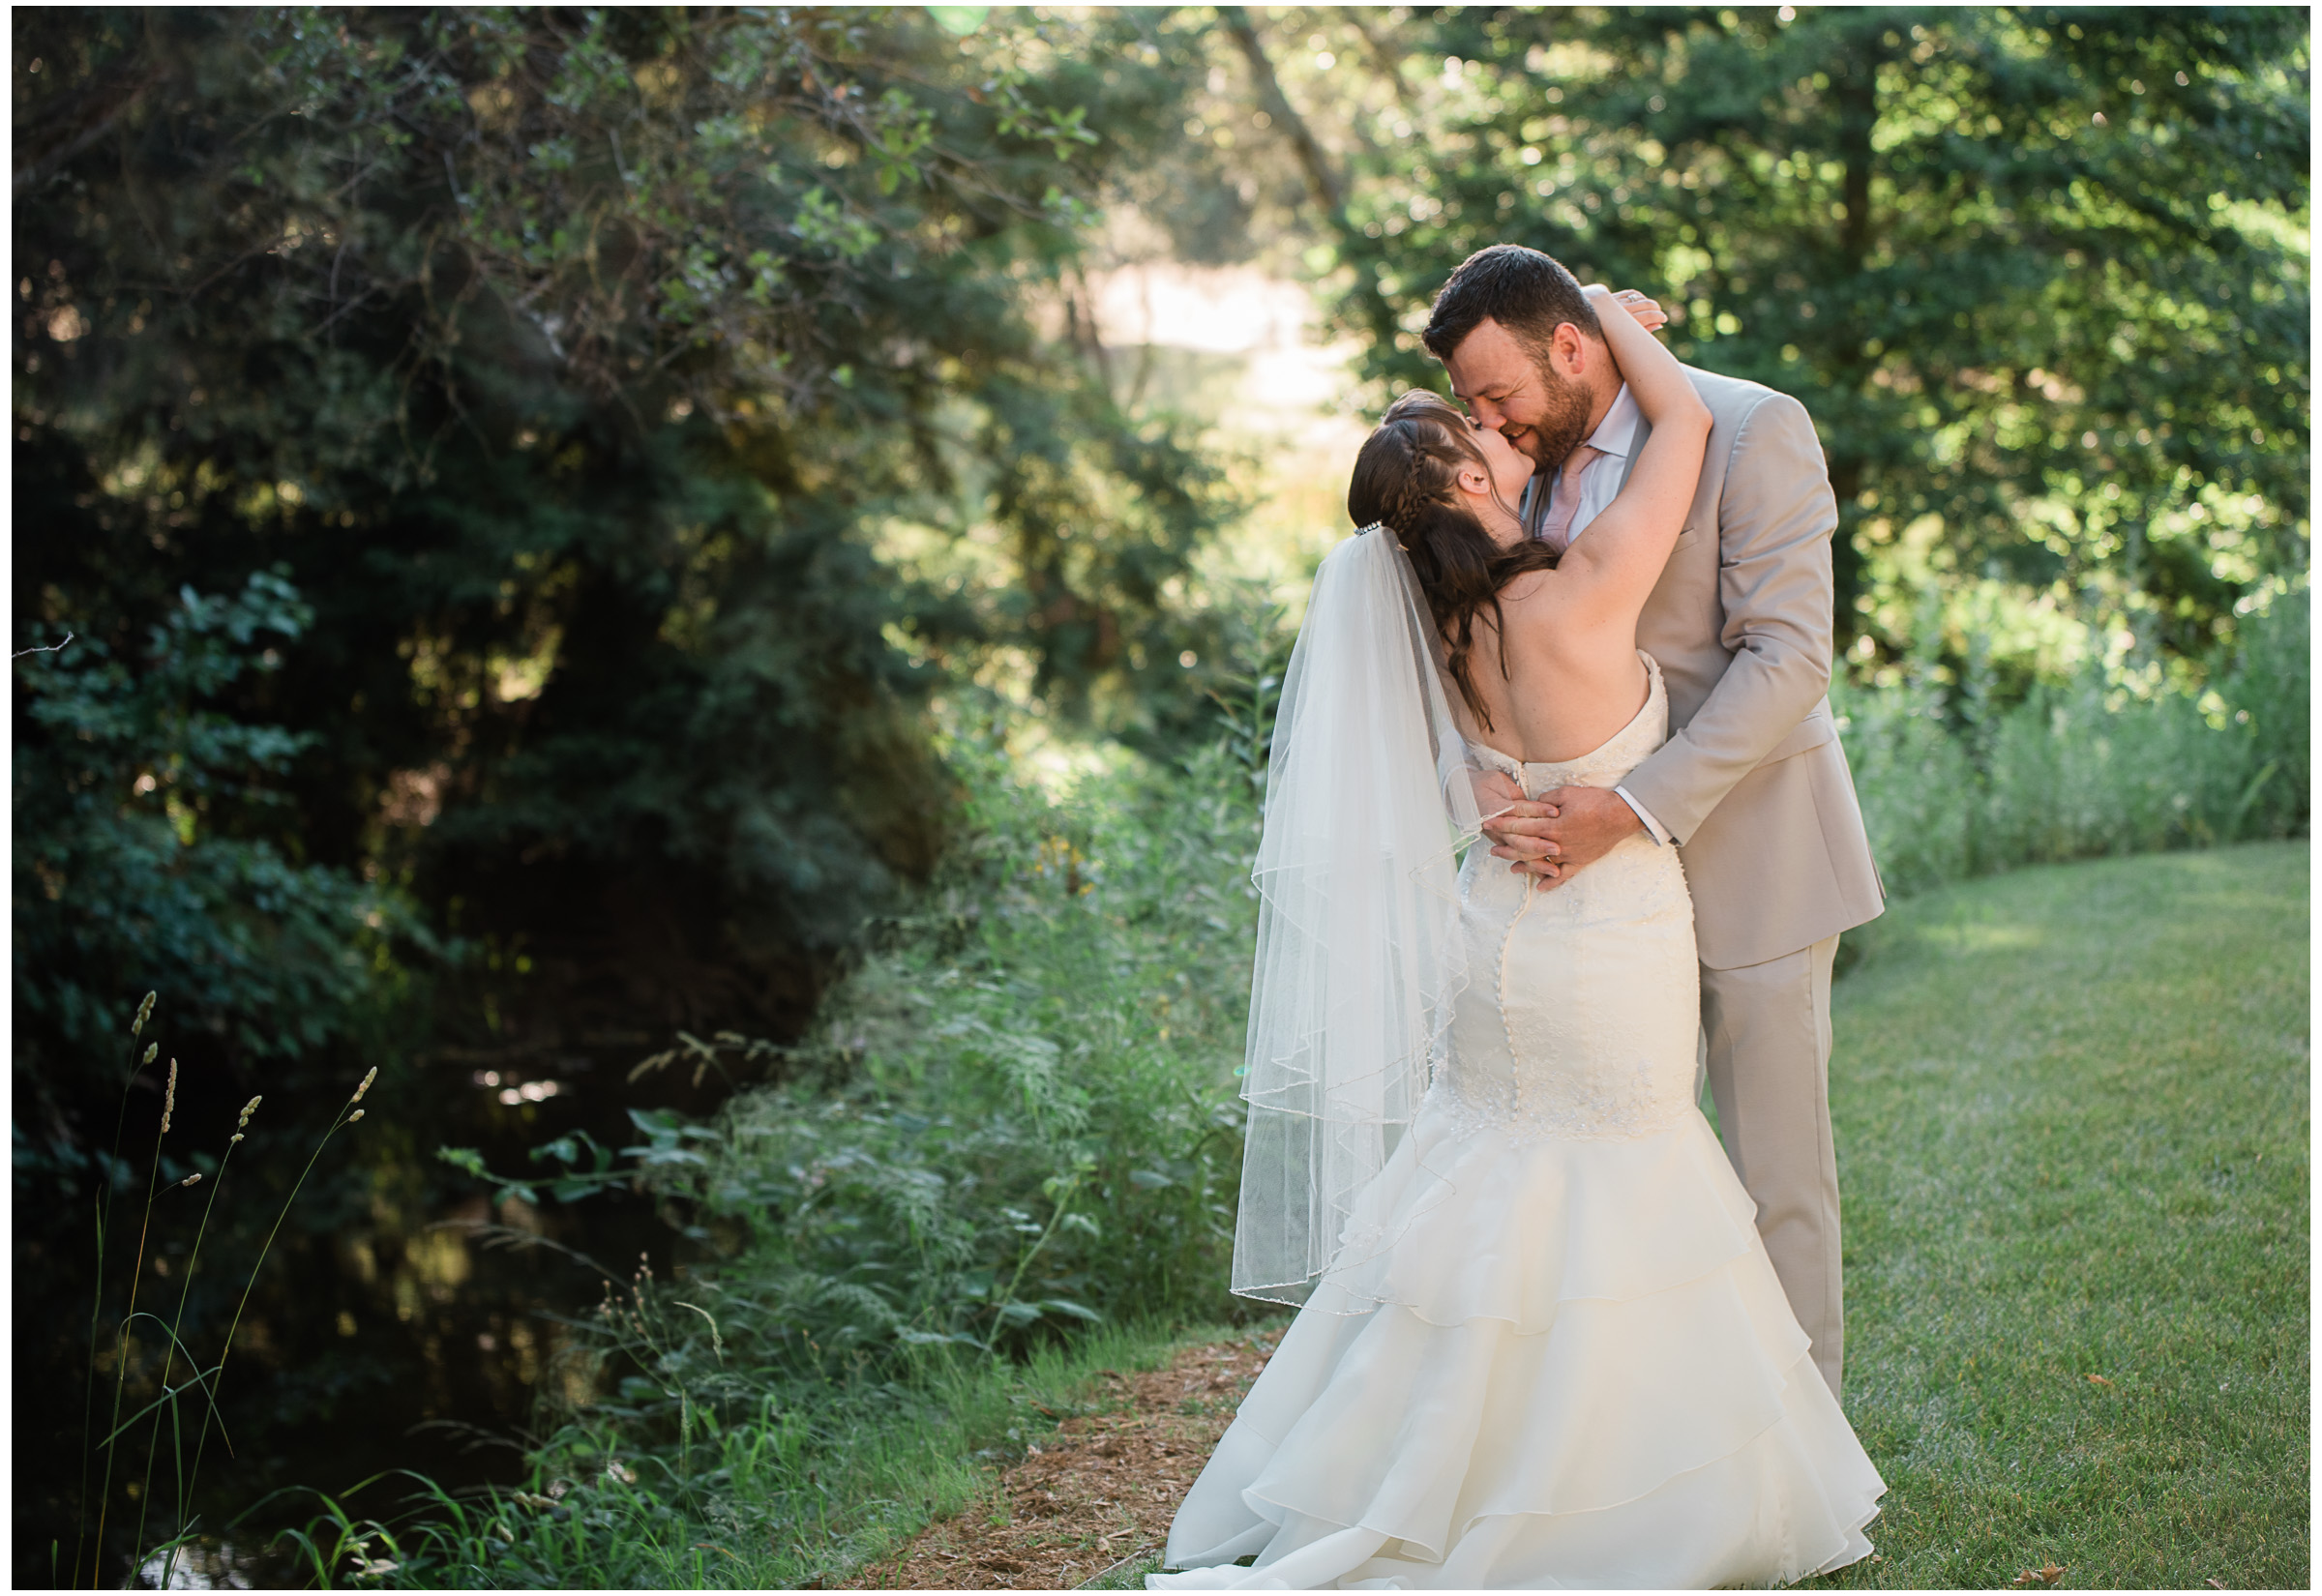 Placerville Wedding - Sacramento Photographer - Justin Wilcox Photography - 15.jpg